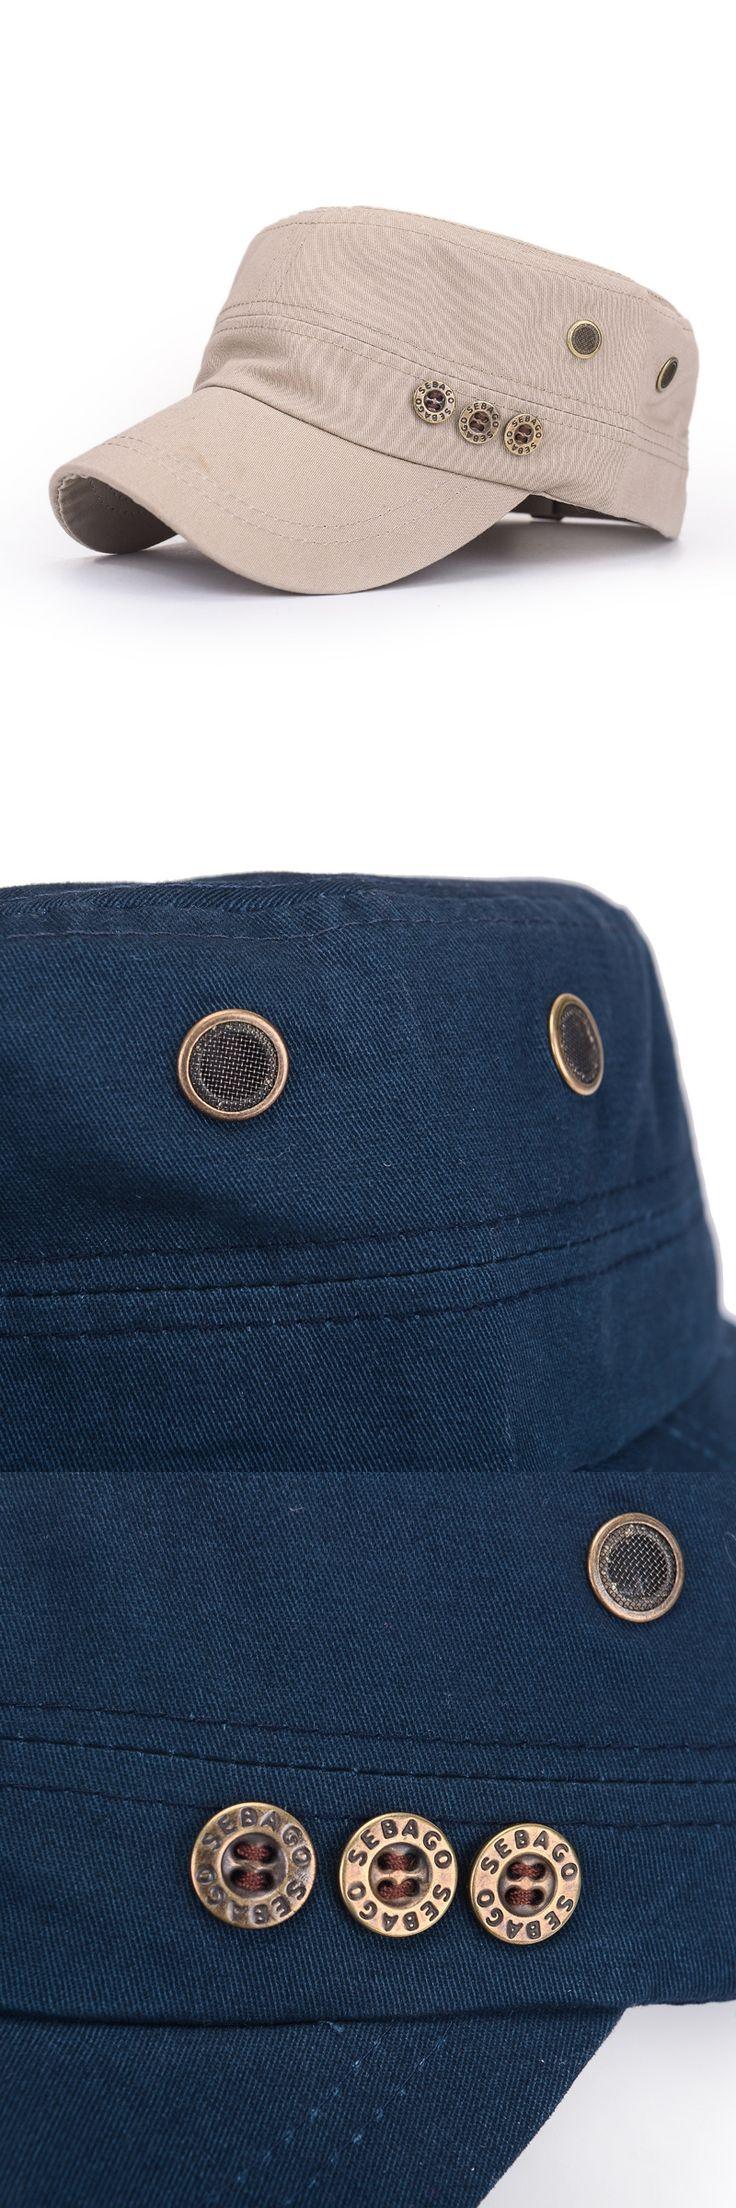 The New Korean Men and Women Flatcap Spring Fashion Buttons COTTON HAT Taobao Hot Cap Peaked Cap